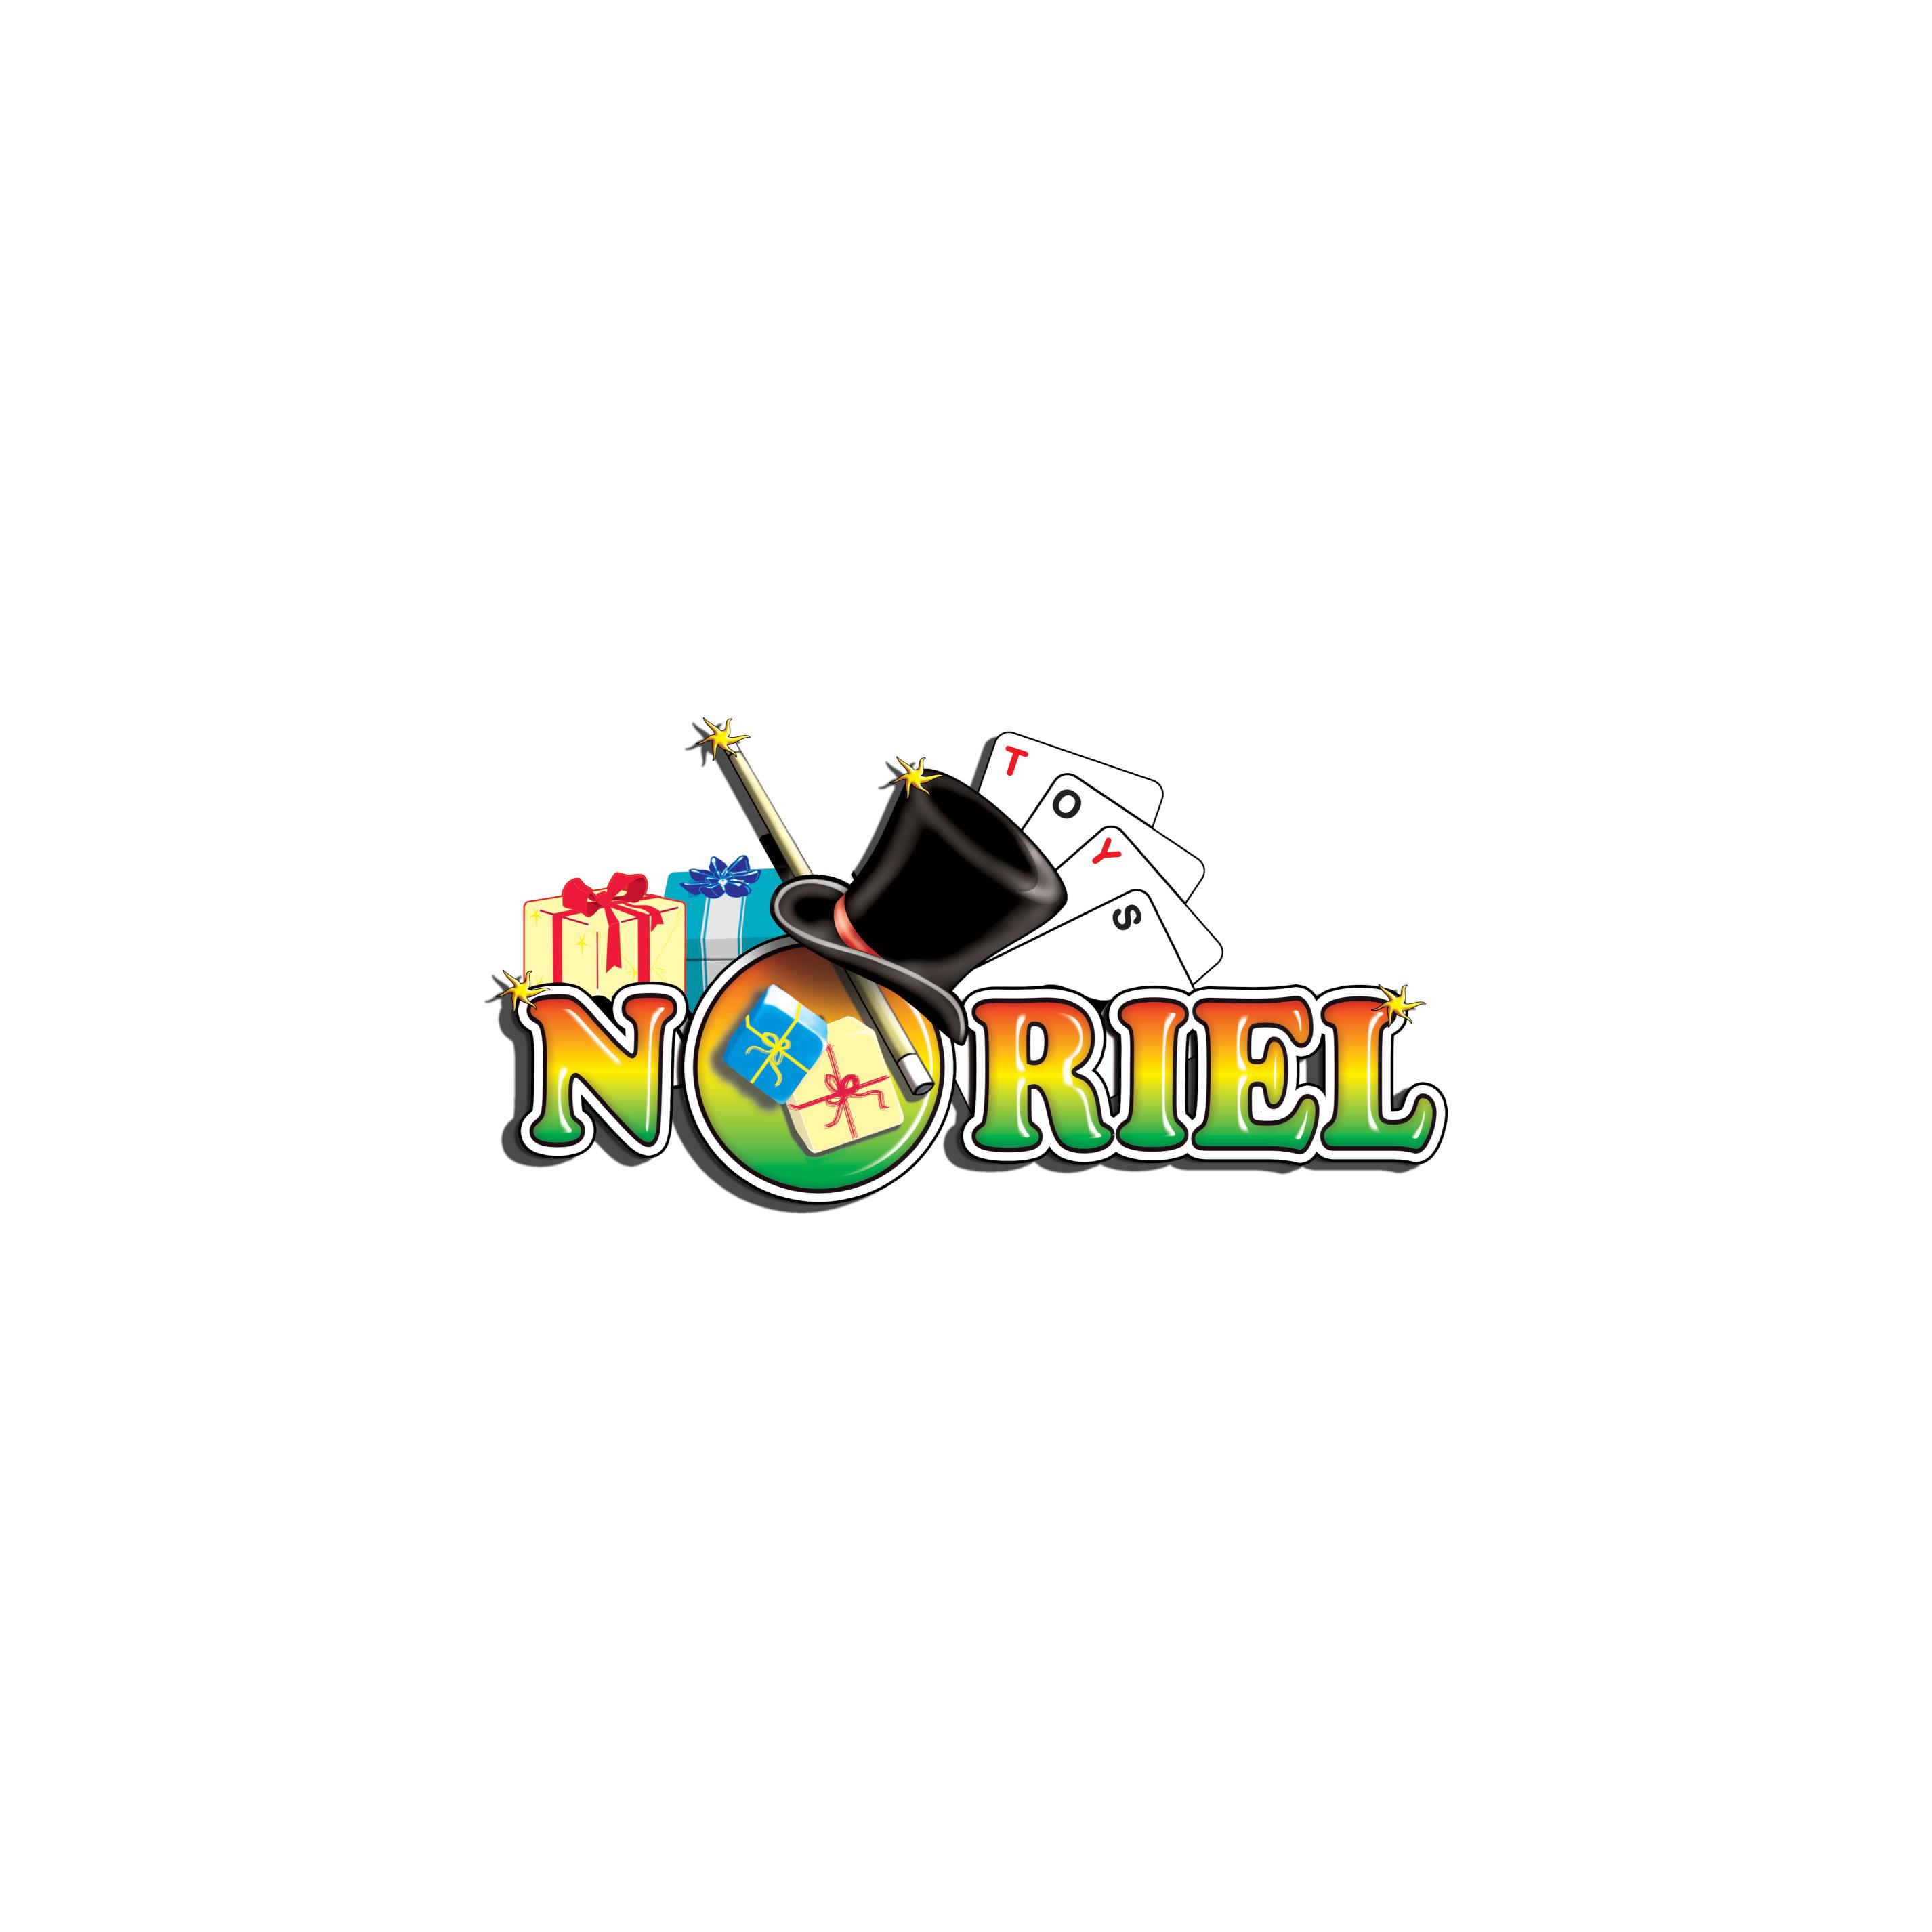 DOLU3024_001w Ansamblu de joaca pentru copii 7 in 1 Dolu